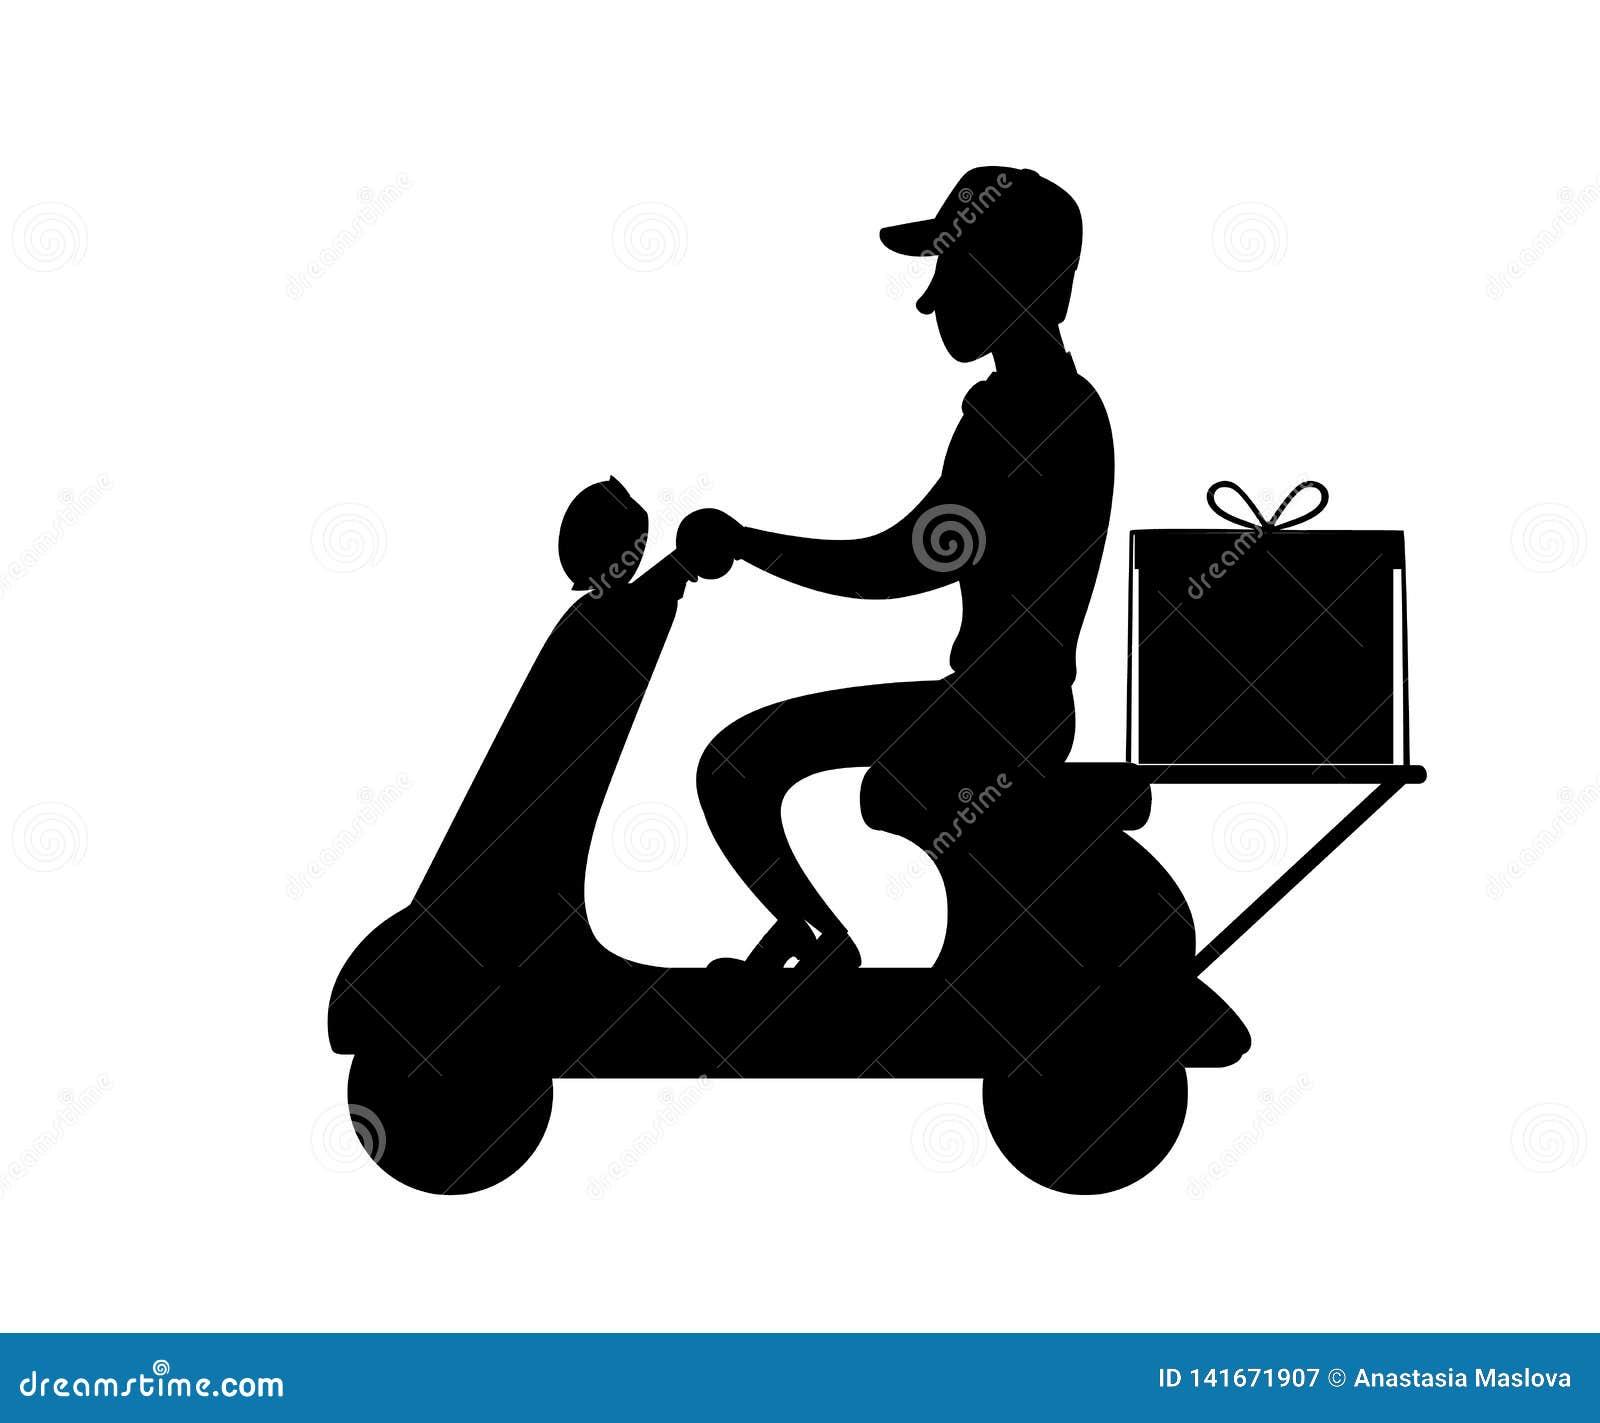 Svart silhouette Leveransman p? sparkcykeln Matkurir Man med baseballm?ssan Plan illustration som isoleras p? vit